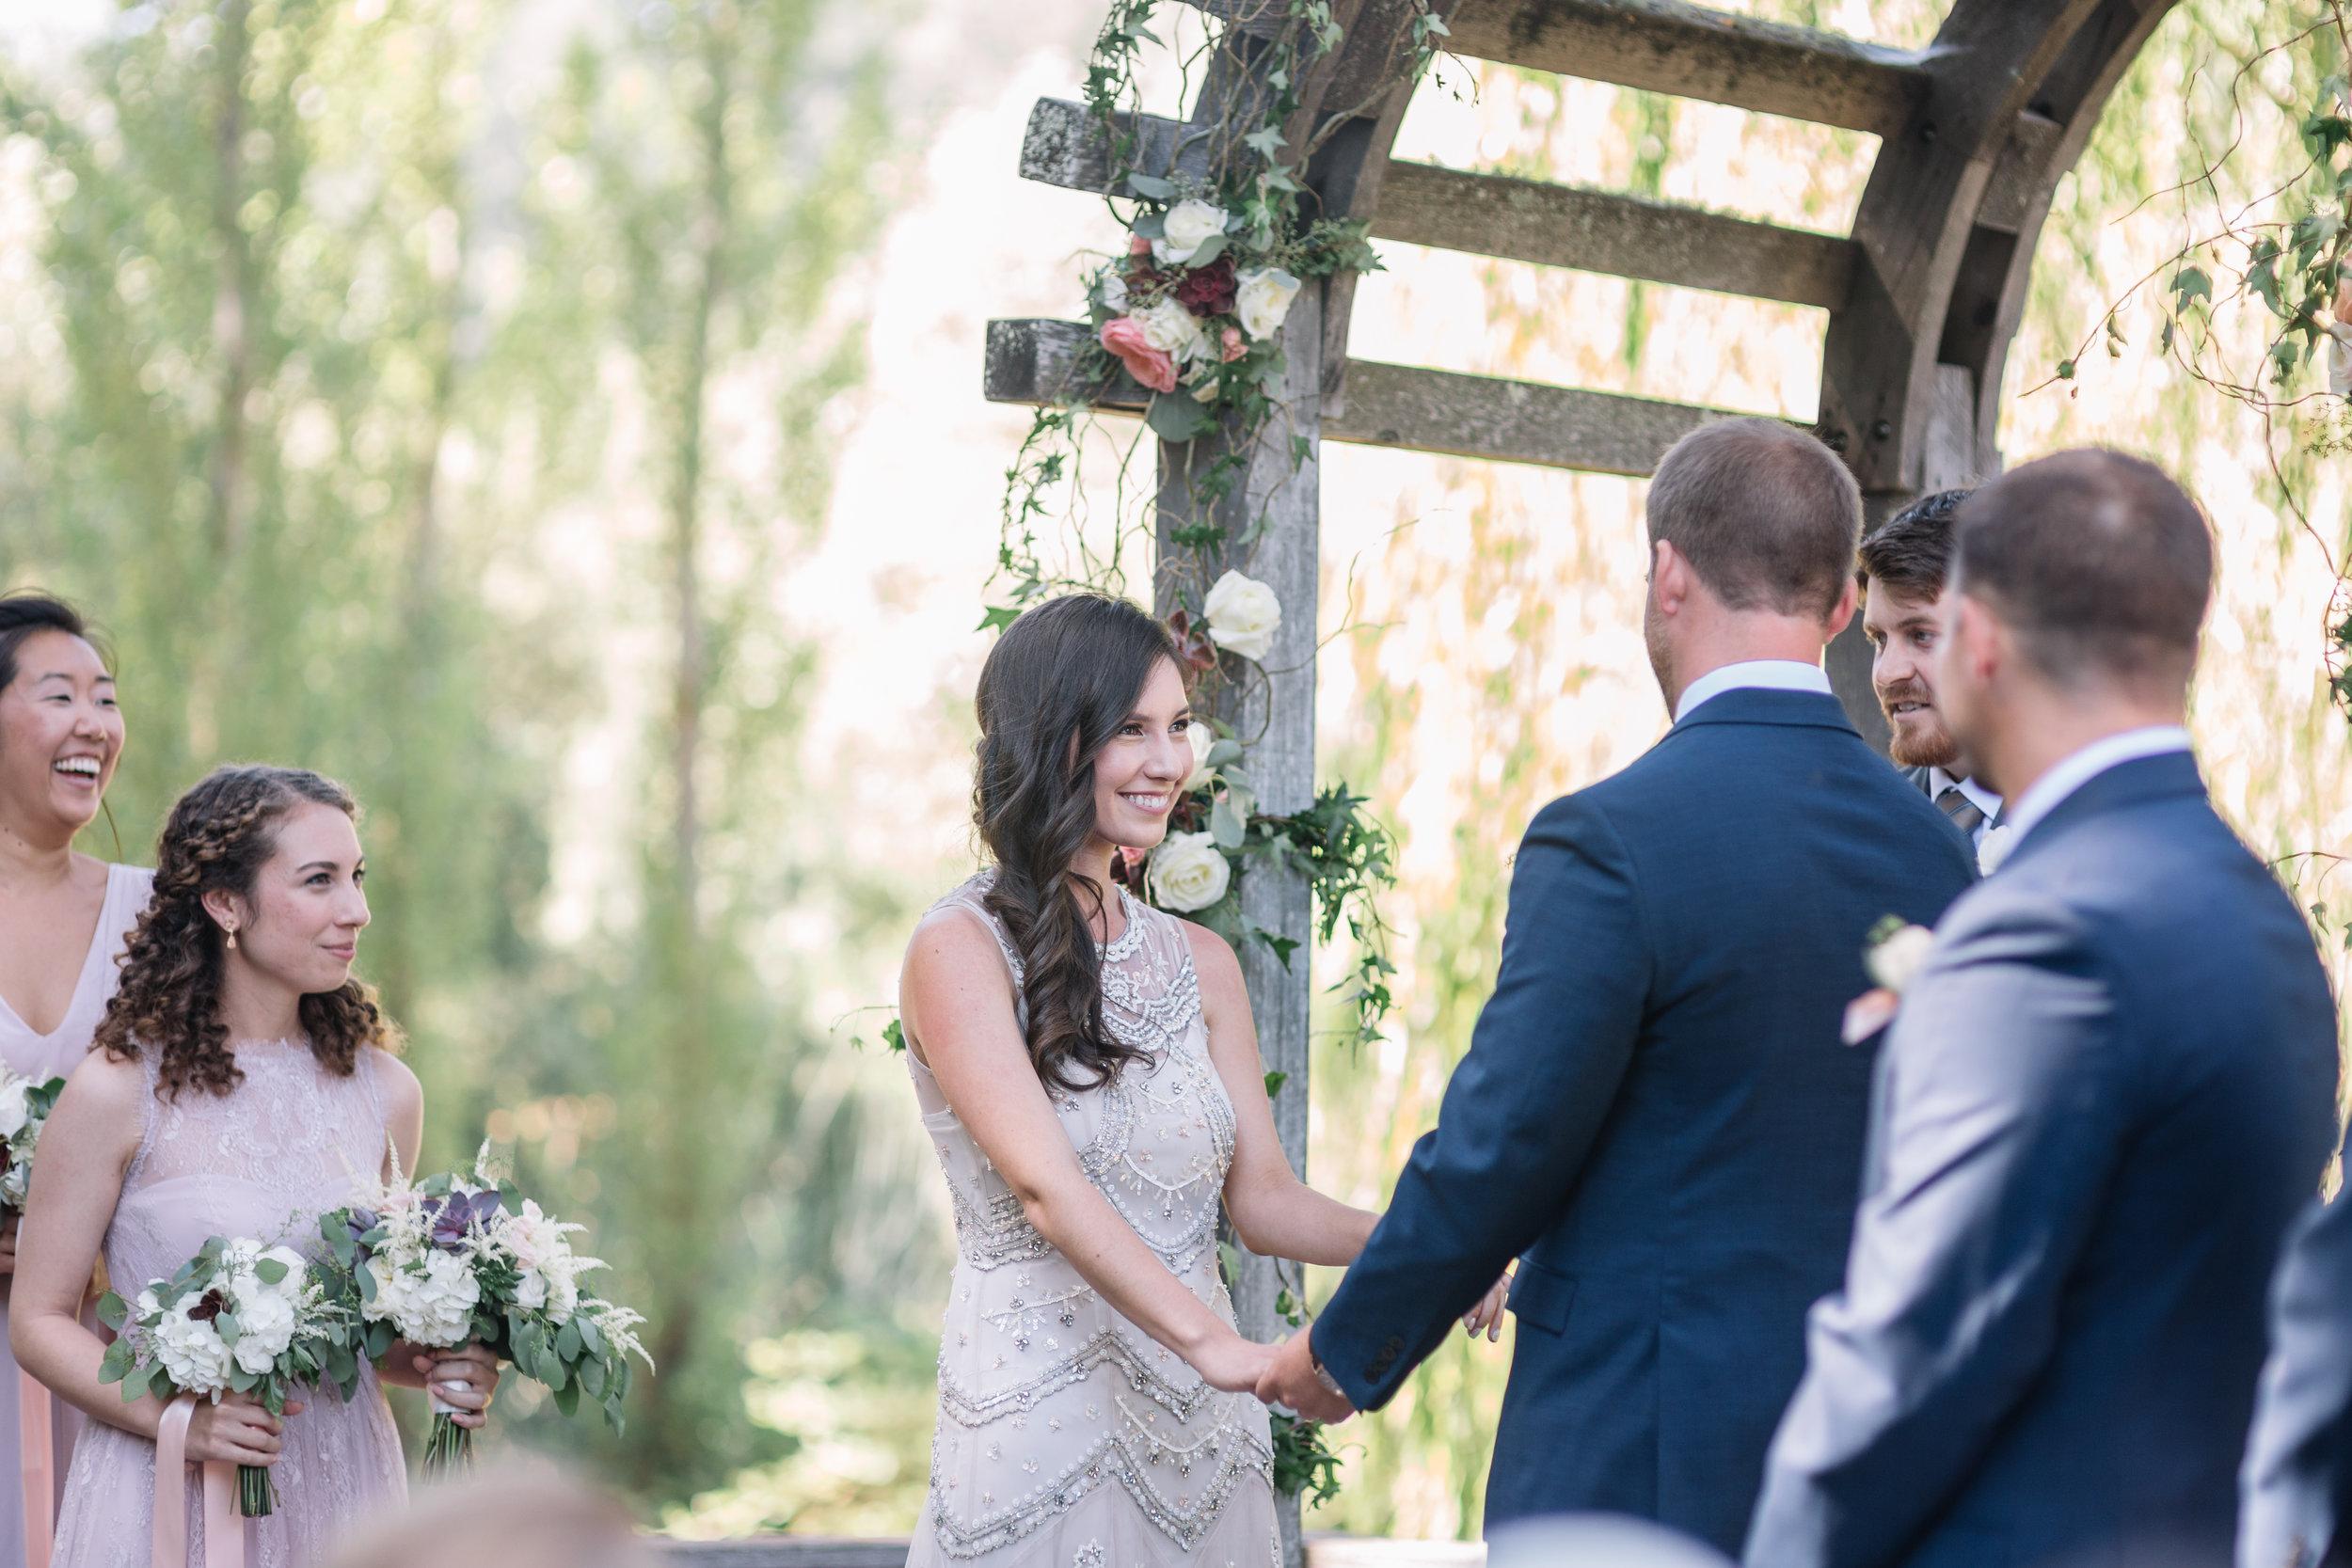 LishaWangPhotography_Carly_Matt_Wedding-107.jpg